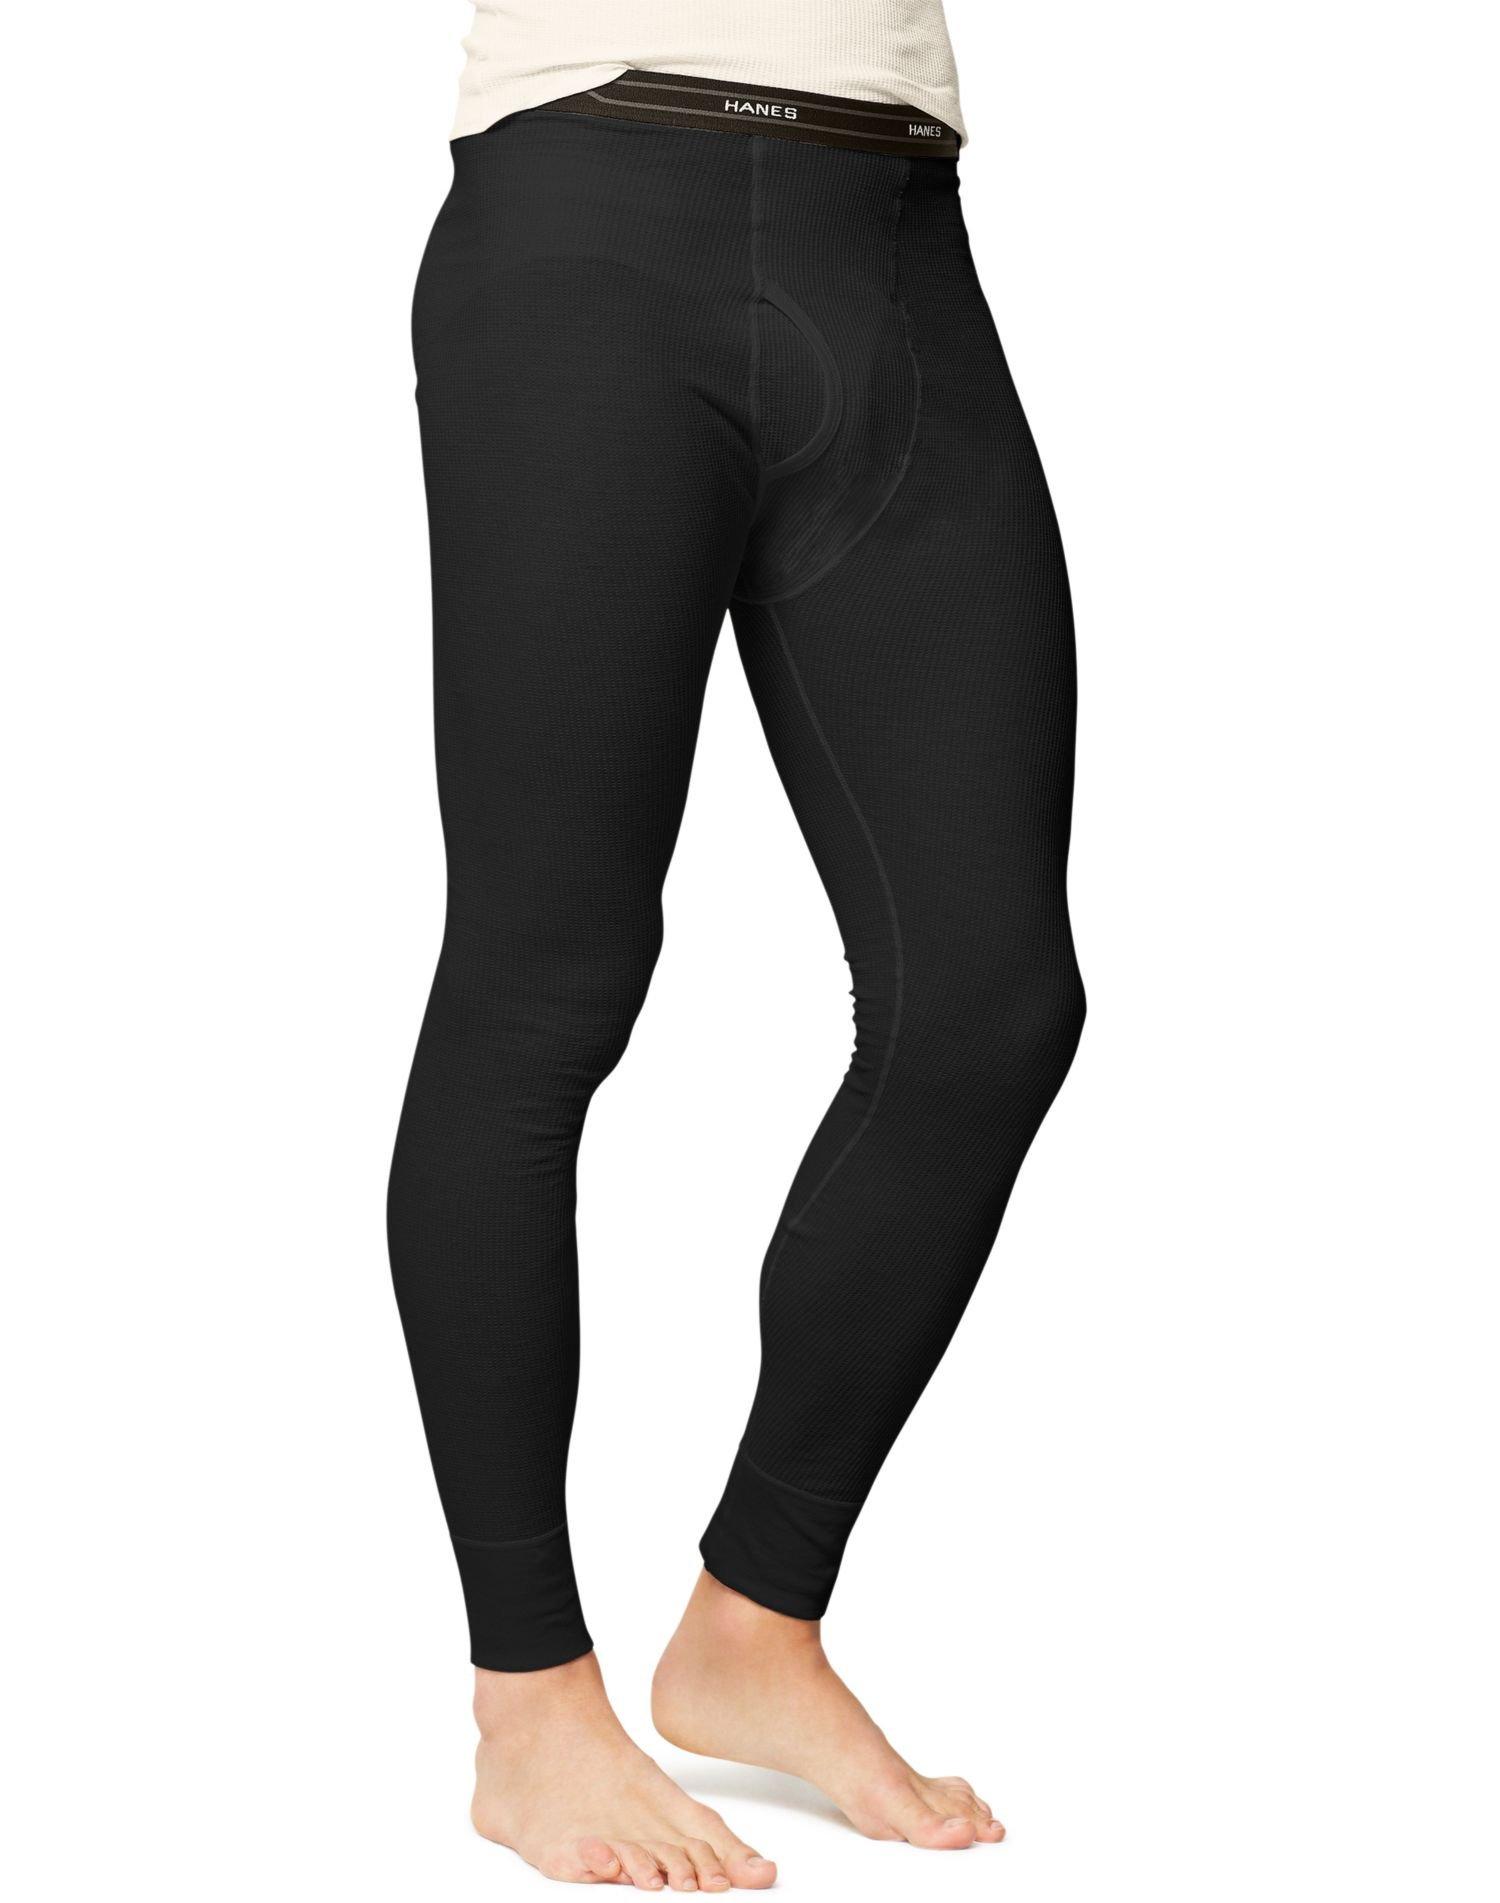 Hanes Men's Big Ultimate Thermal Pant, Black, Small by Hanes